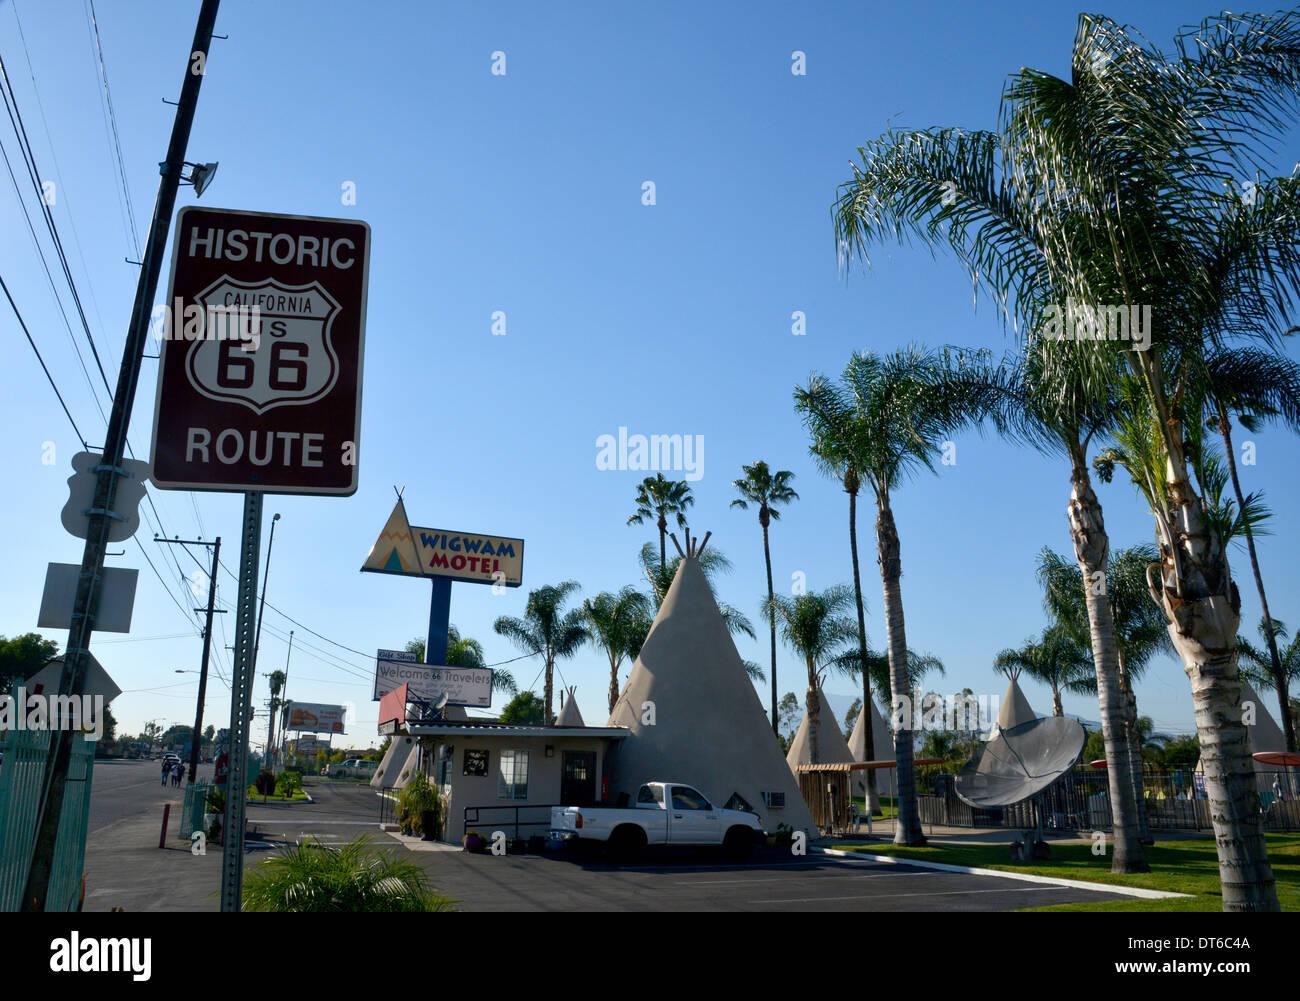 Motel  San Bernardino Ca